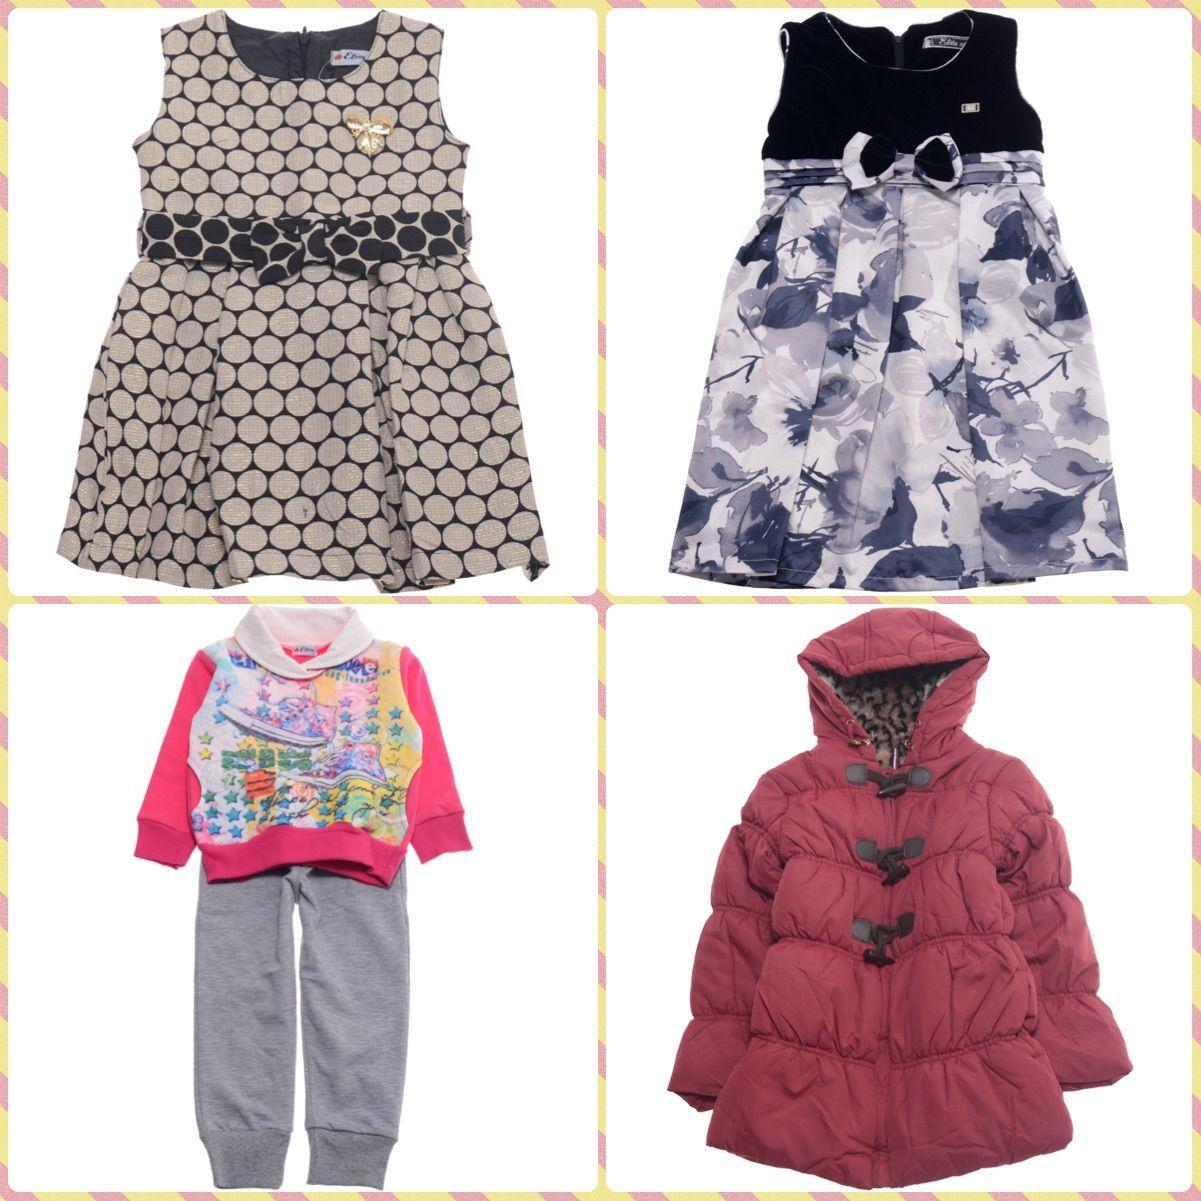 94e8cf7acfa ΛΕΥΚΑ ΕΙΔΗ *Πετσέτες - Παιδικά ρούχα, βρεφικά ενδύματα, λευκά είδη ...